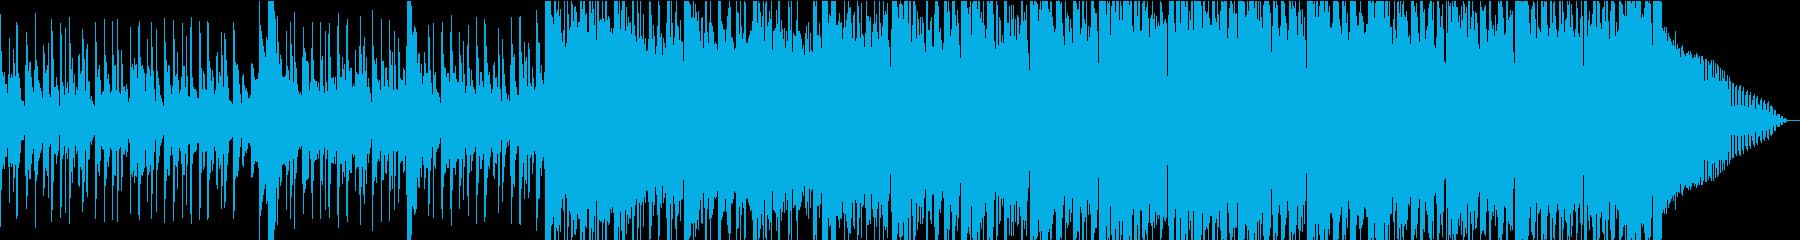 KANT動画用古代的BGMの再生済みの波形